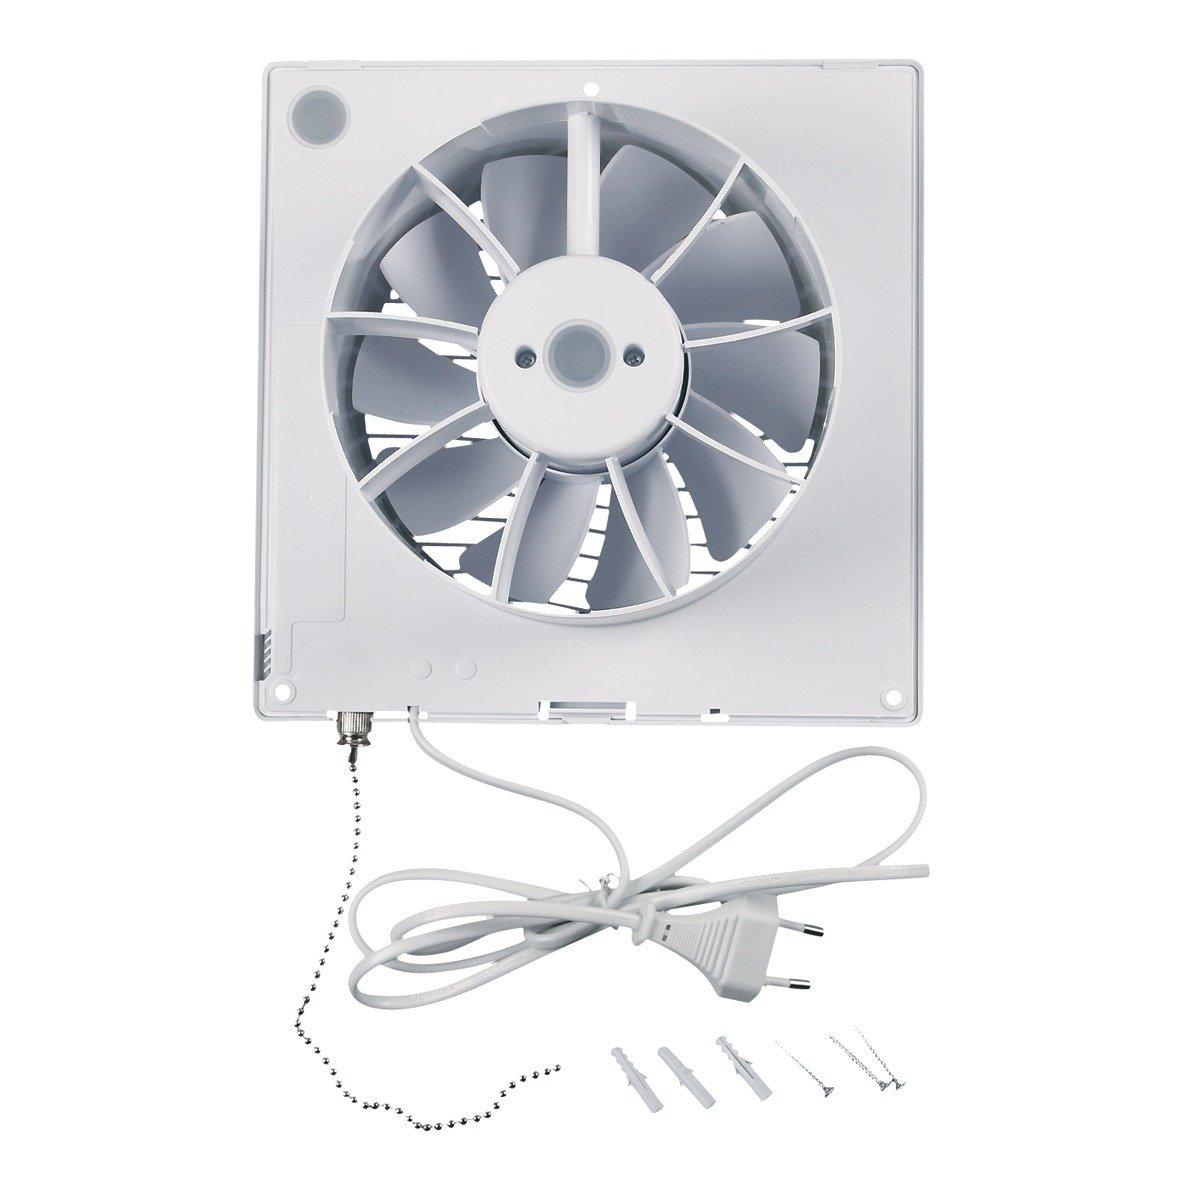 Europart 10032326 Abluft Ventilator Lüfter 150er 20W 1450 U/min ...